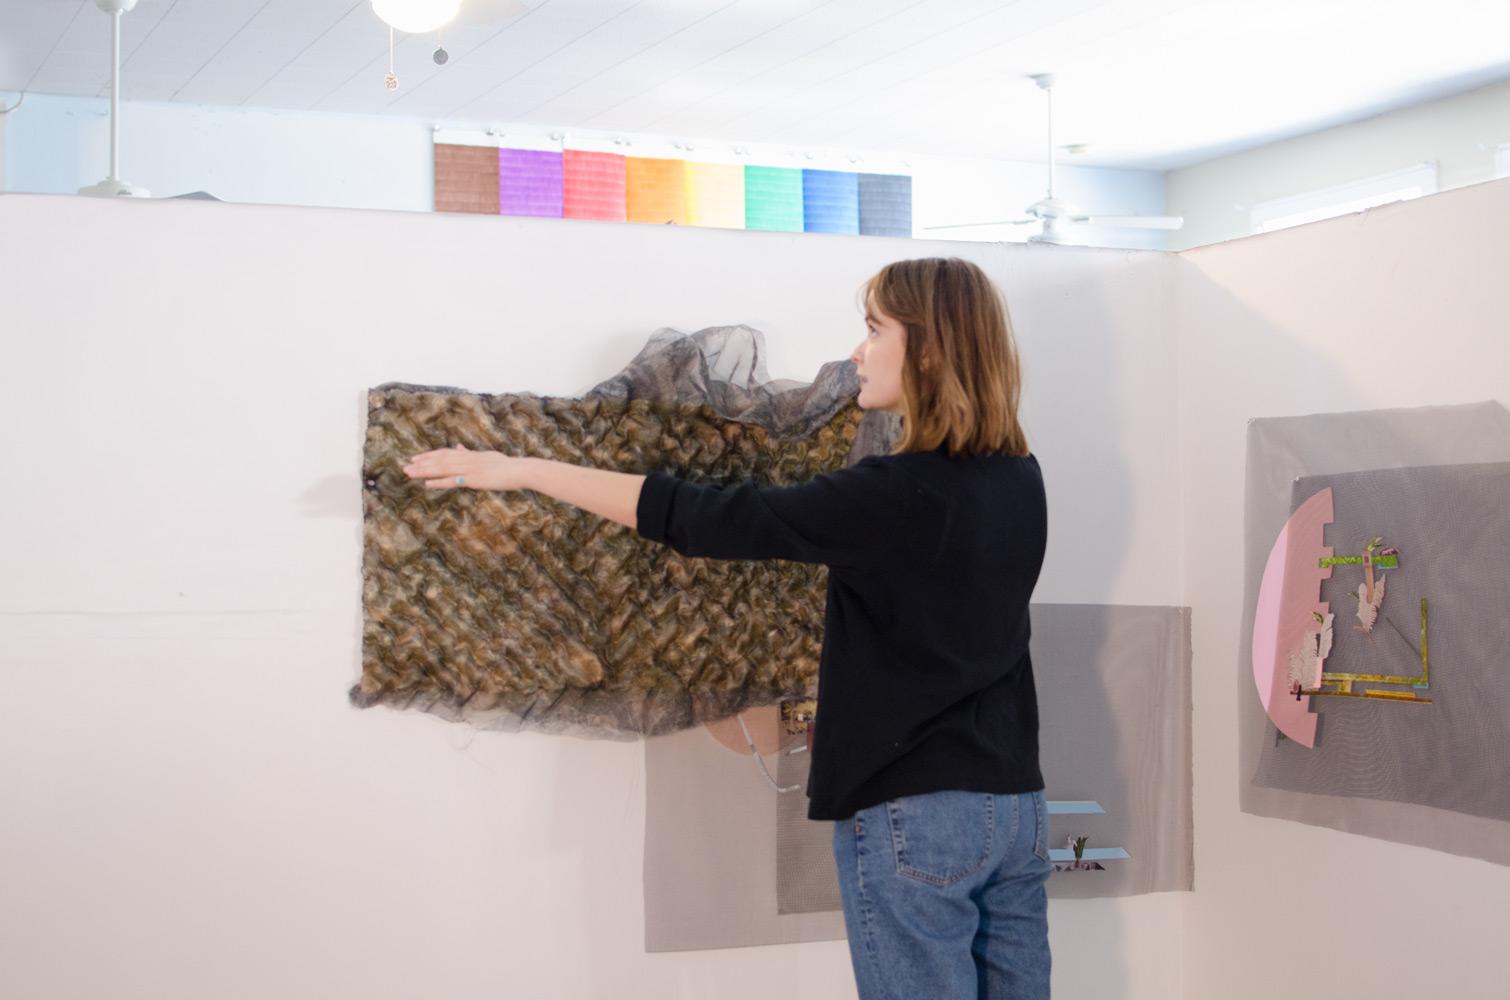 moth-oddities-blog-megan-cline-artists-studio-chicago-14.jpg